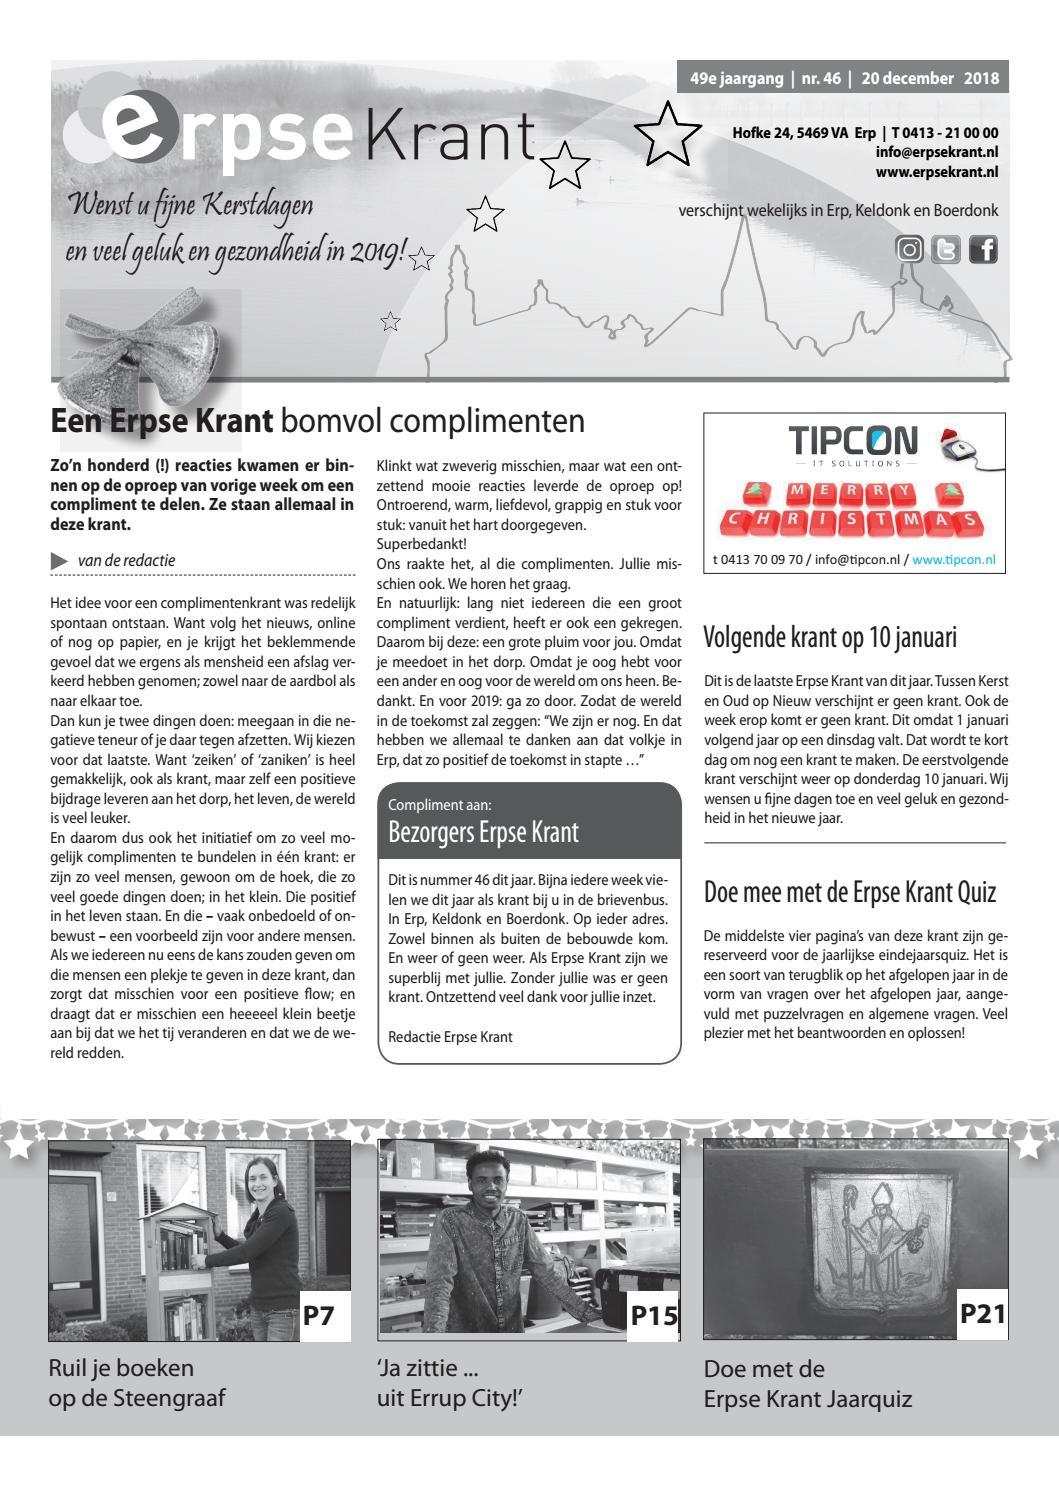 432c417c083 Erpse Krant 2018 - editie 46 by Erpse Krant - issuu